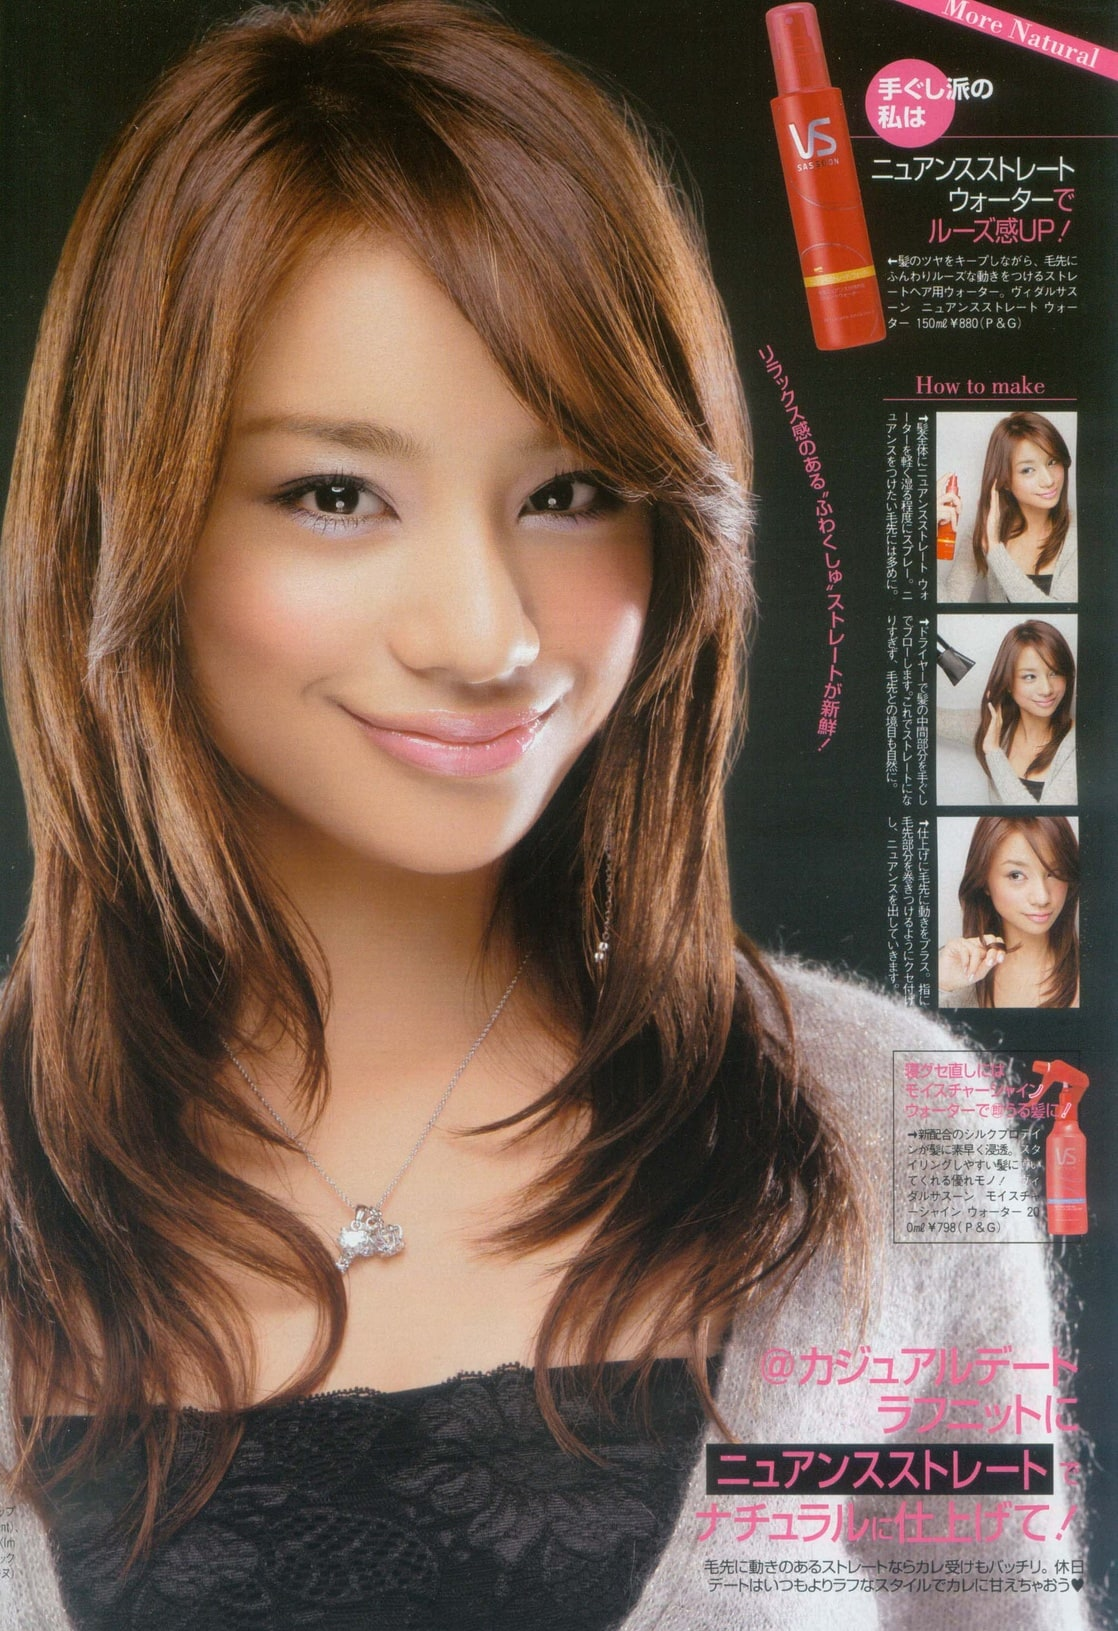 Maryjun Takahashi Nude Photos 21